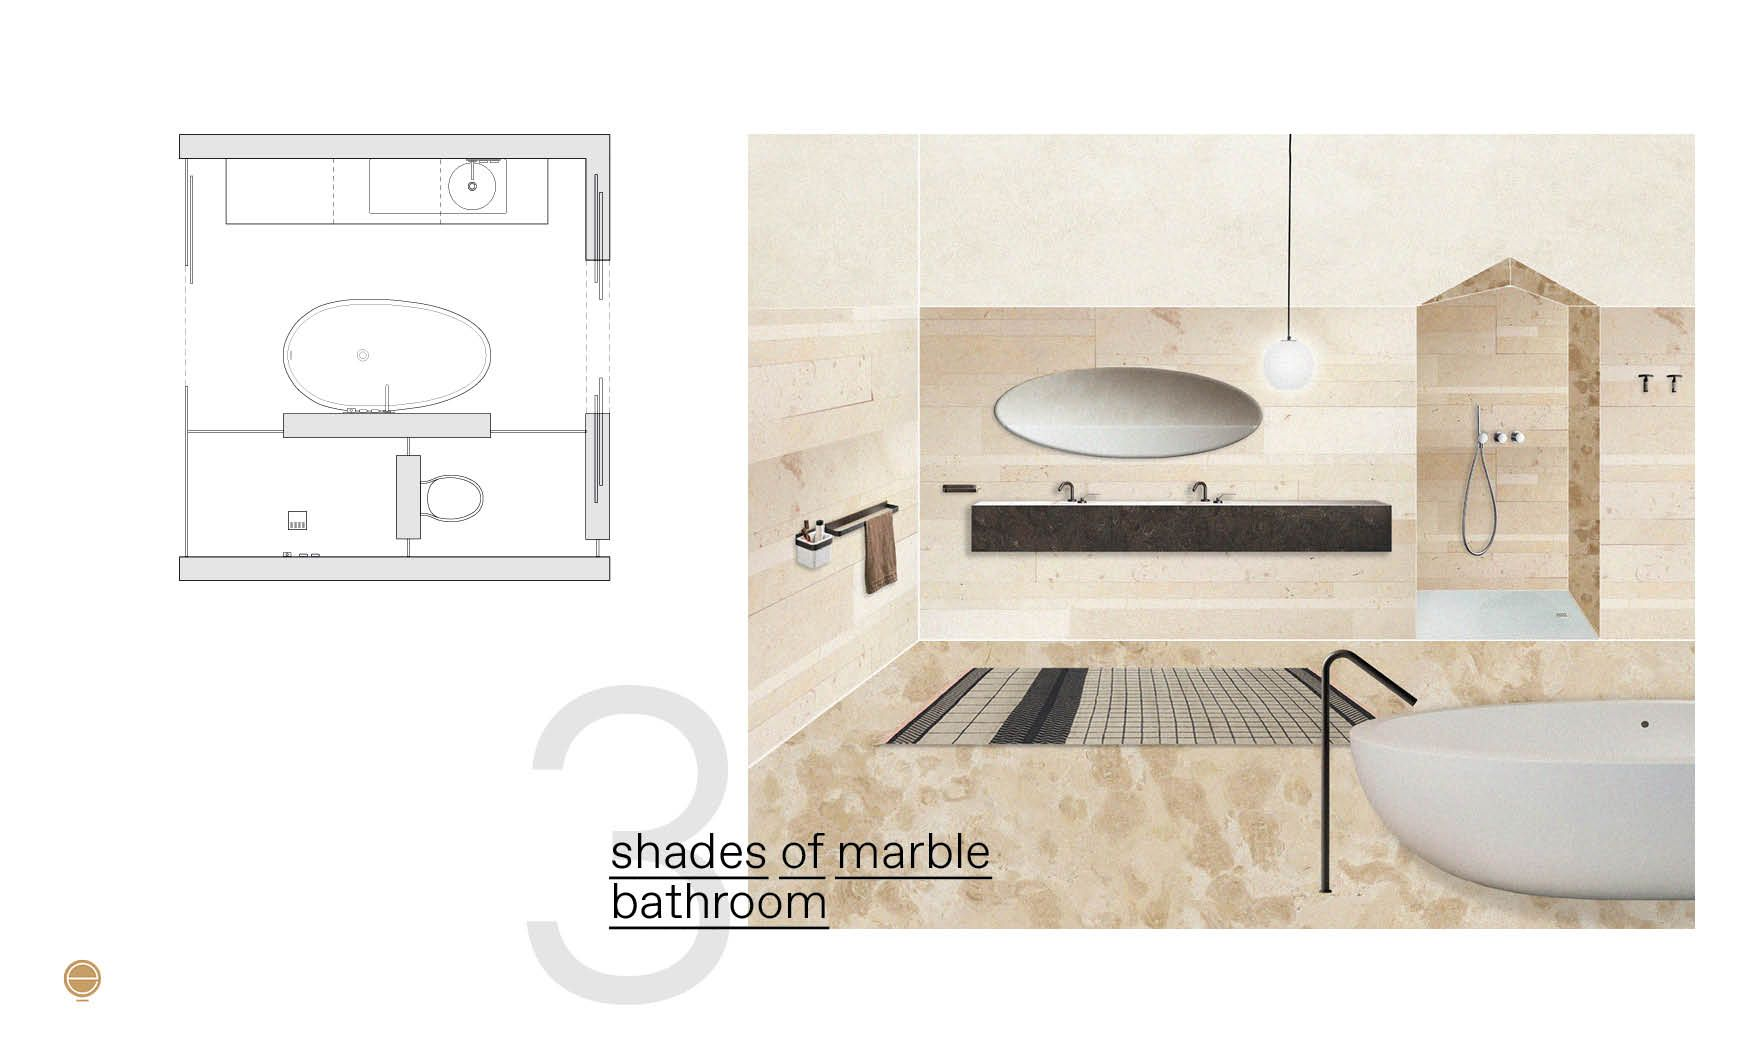 Pin By Esperiri Milano On Bathroom Minimal Italian Home Design In 2020 Italian Bathroom Italian Home Modern Italian